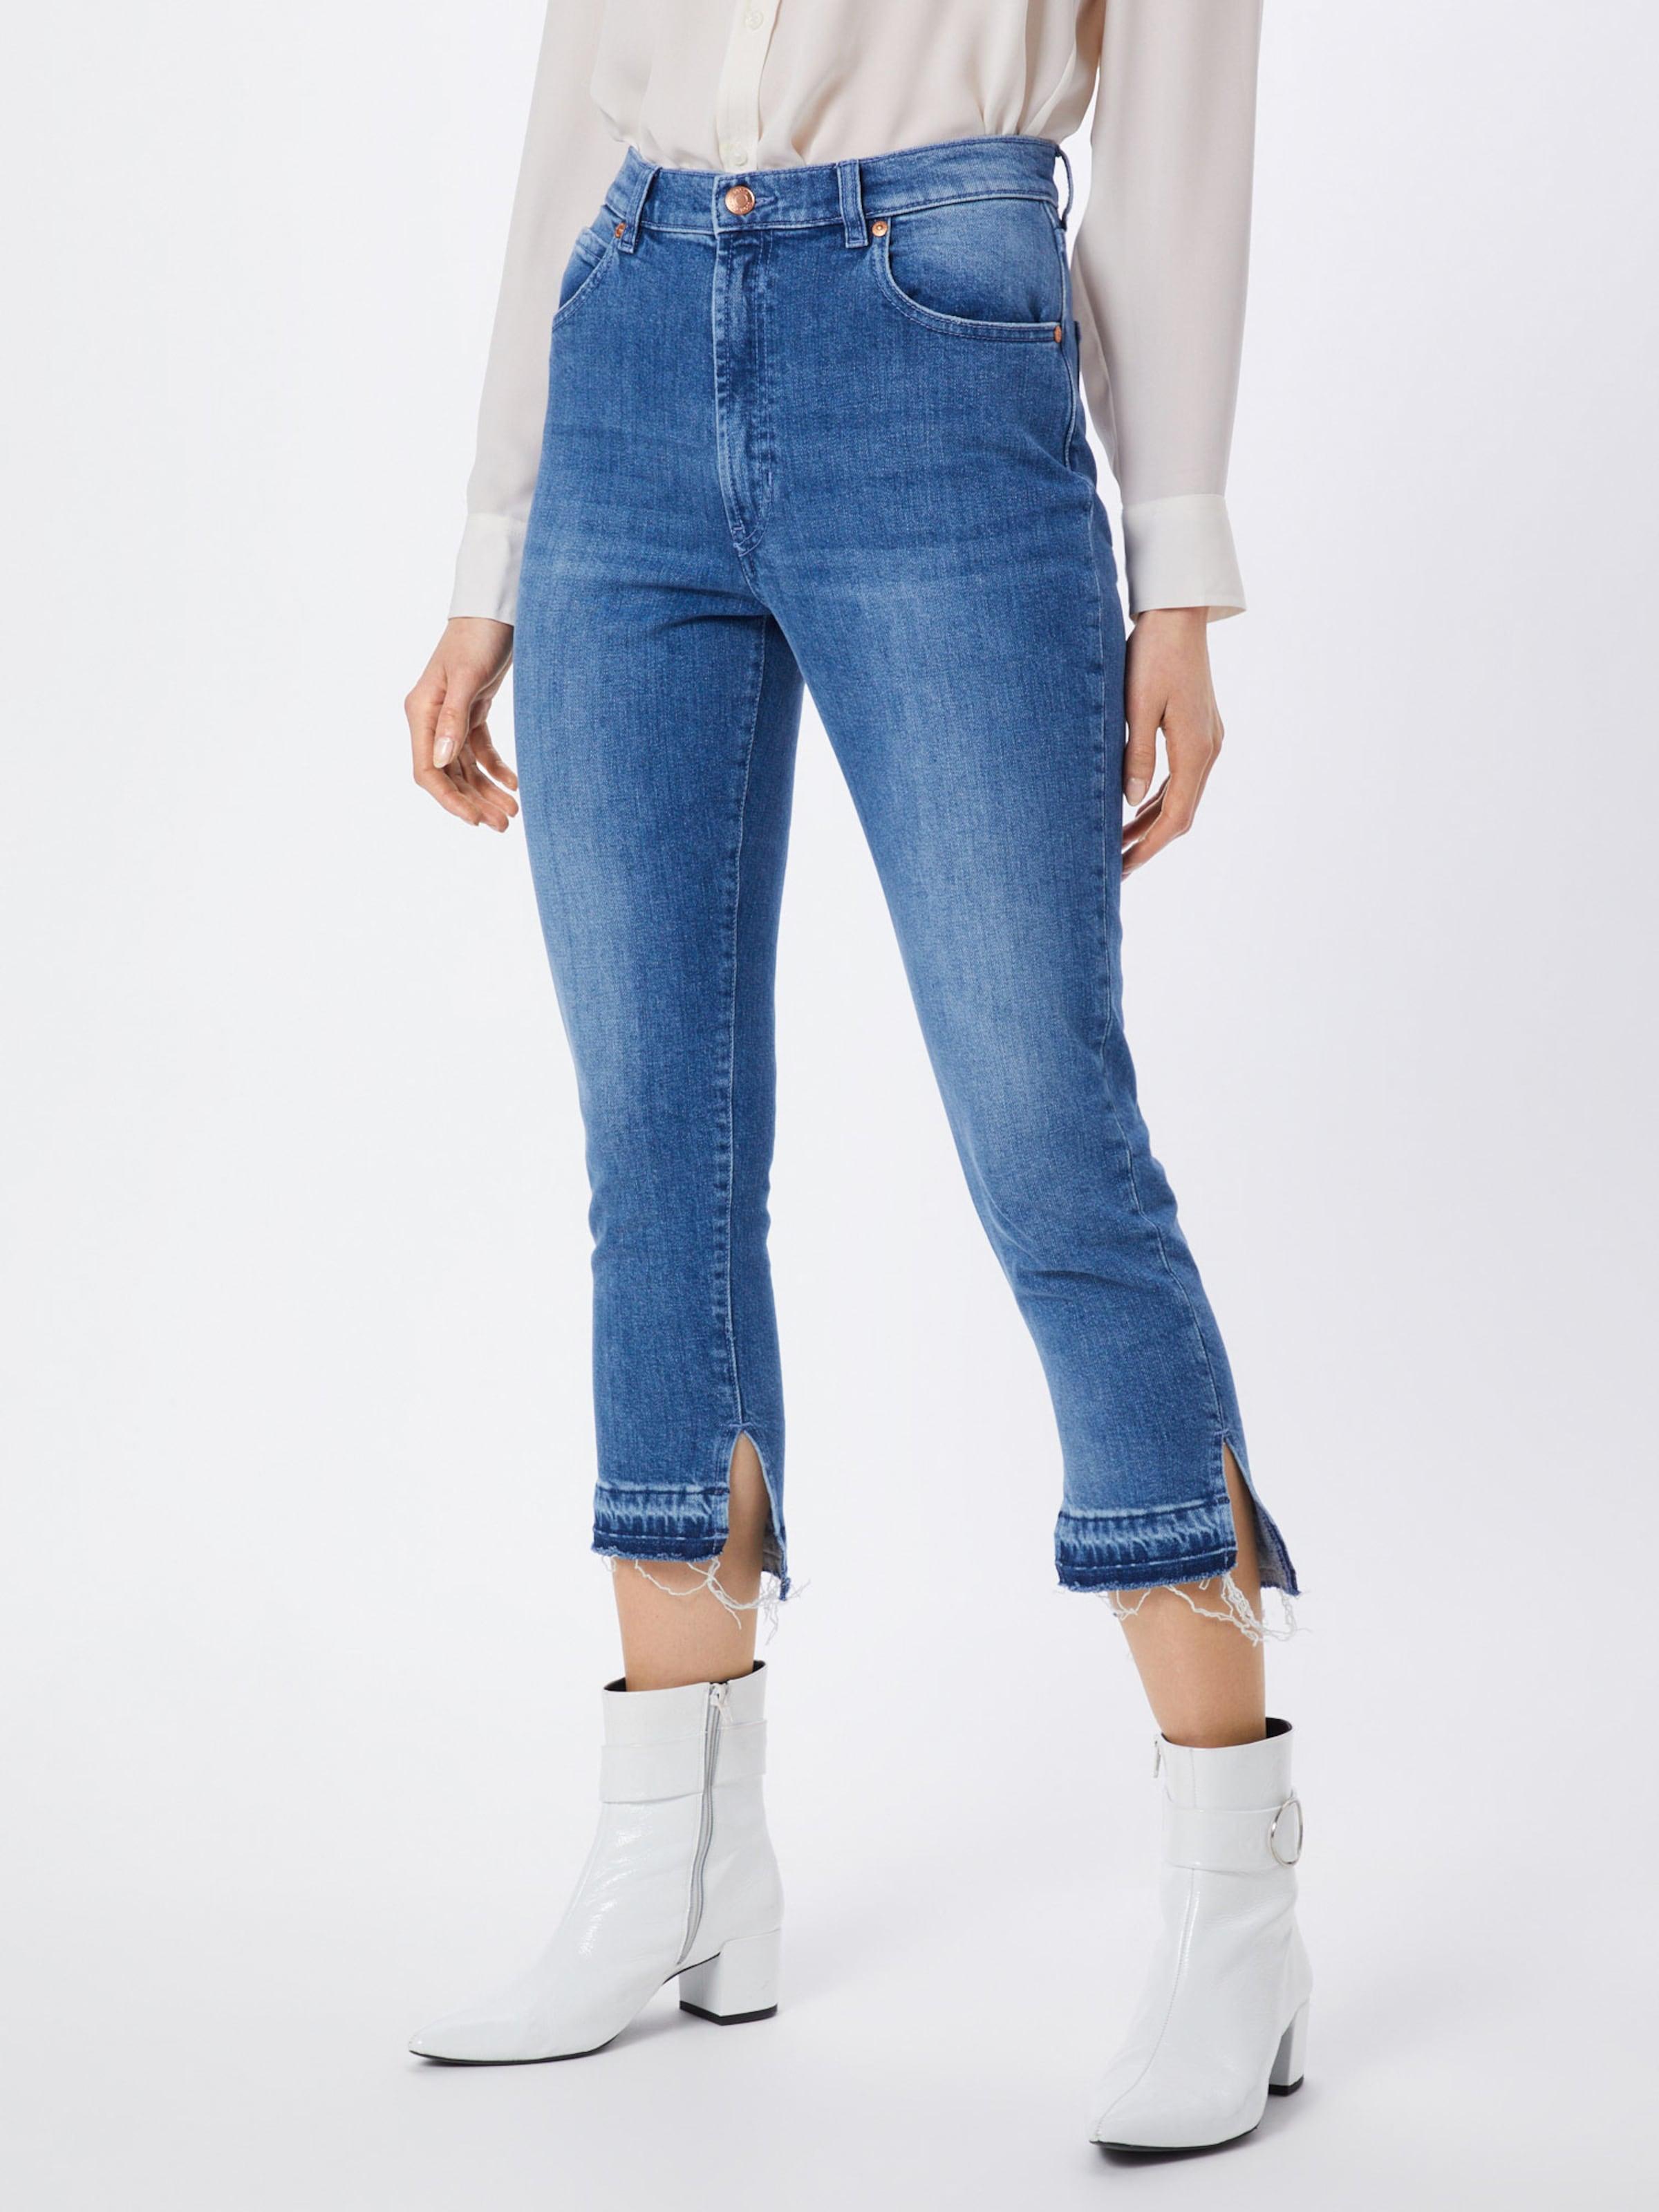 Jeans 2' Hugo 'gerena Denim Blue In 7yfYbgv6